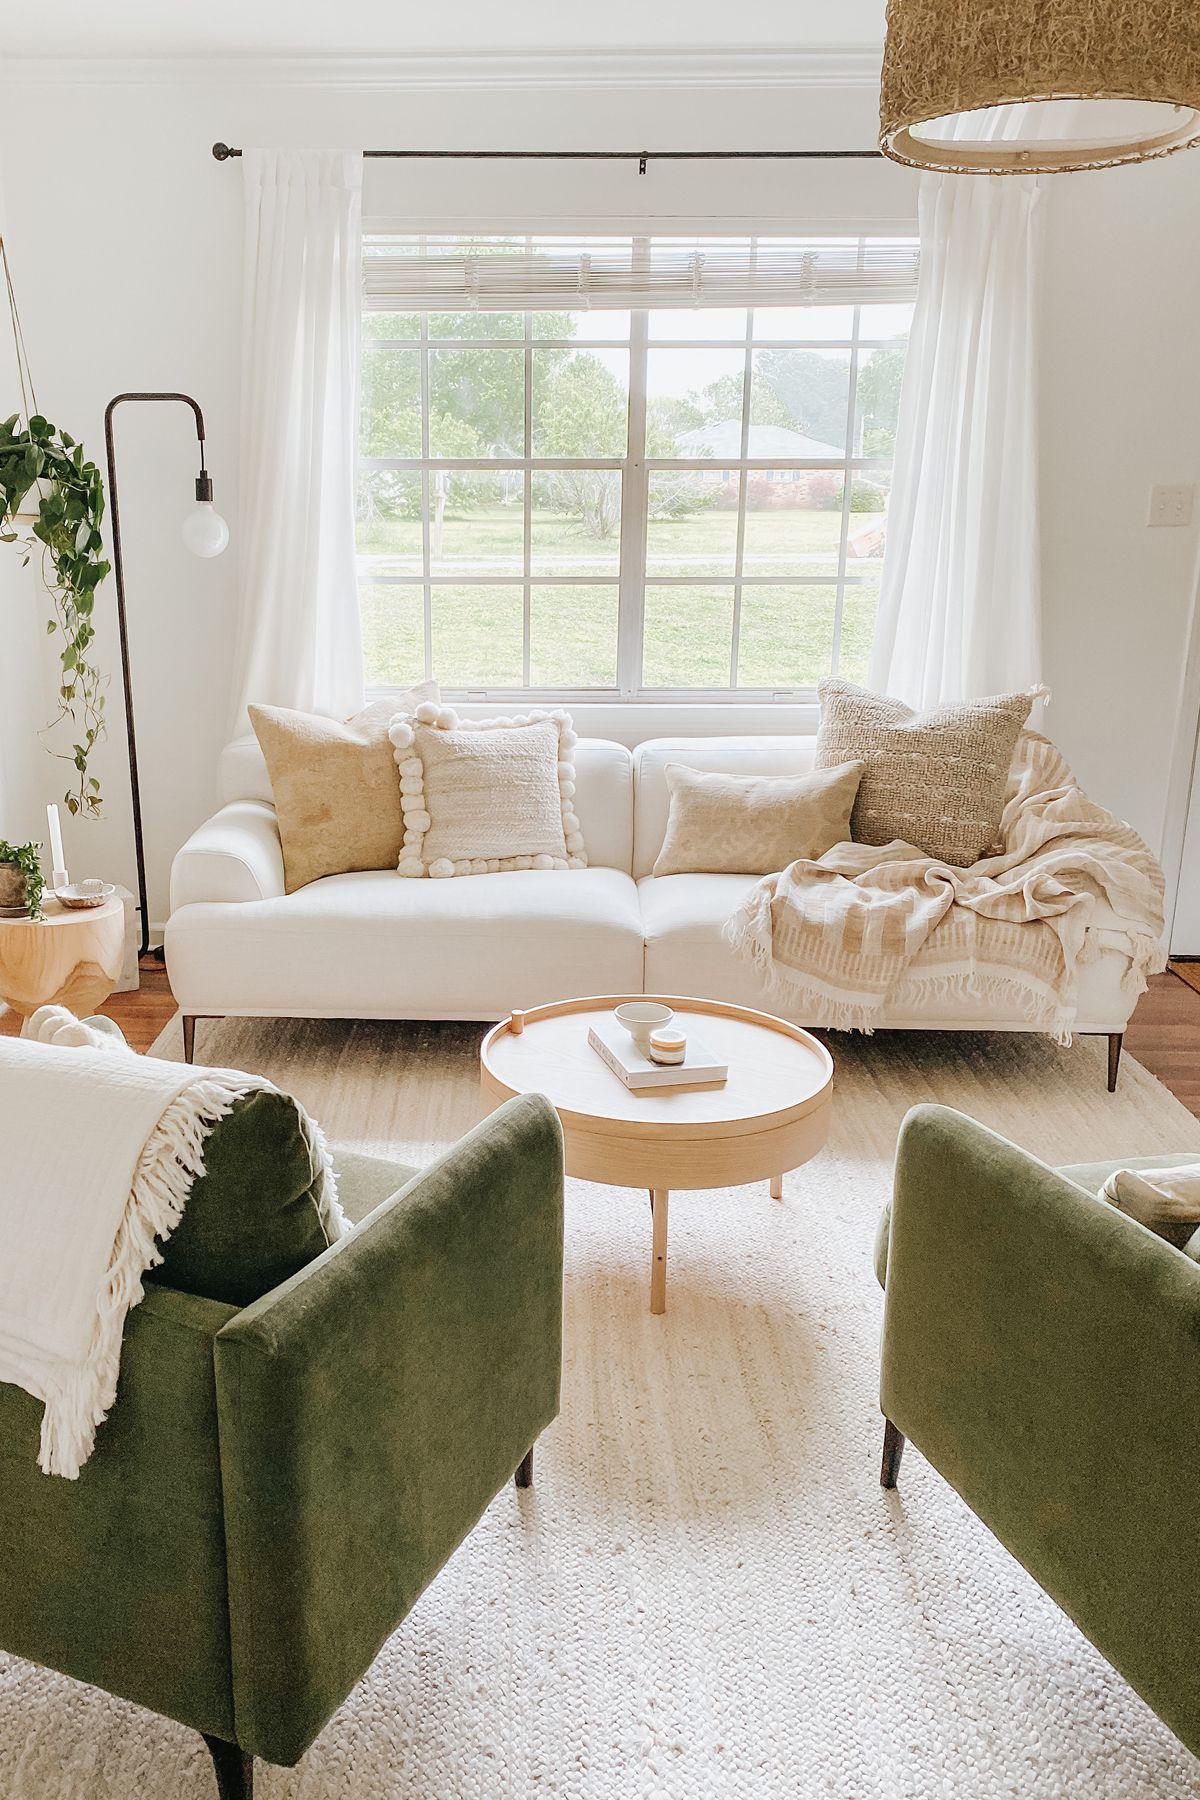 Abisko Quartz White Sofa In 2020 Home Home Living Room Cheap Home Decor